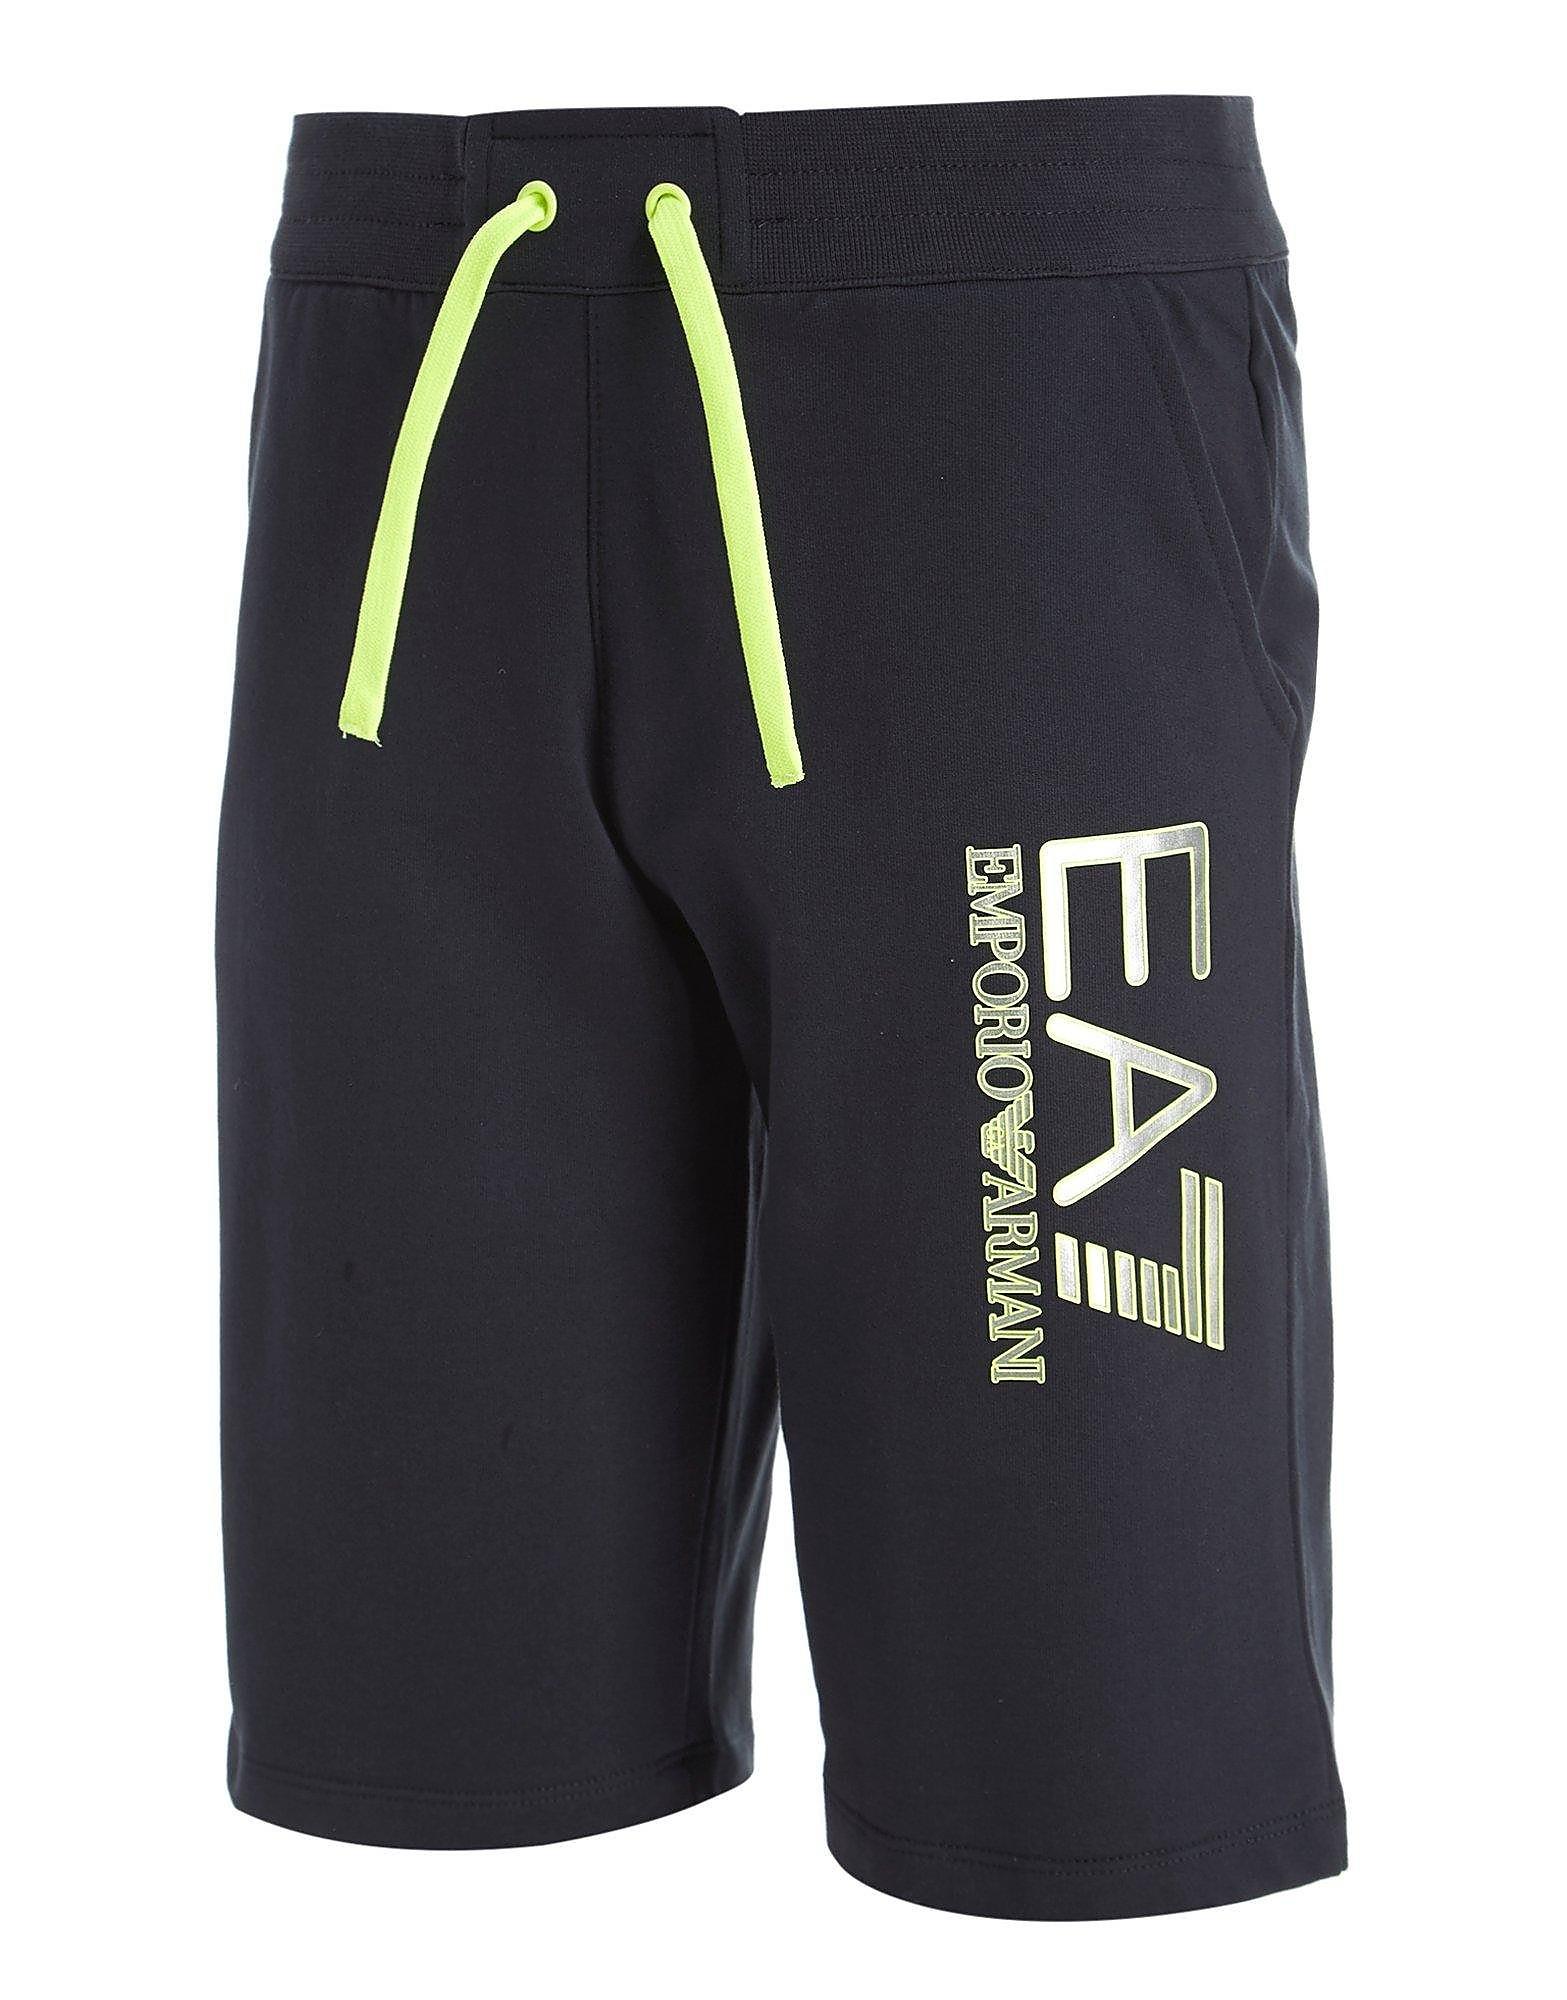 Emporio Armani EA7 Visibility Fleece Shorts Junior